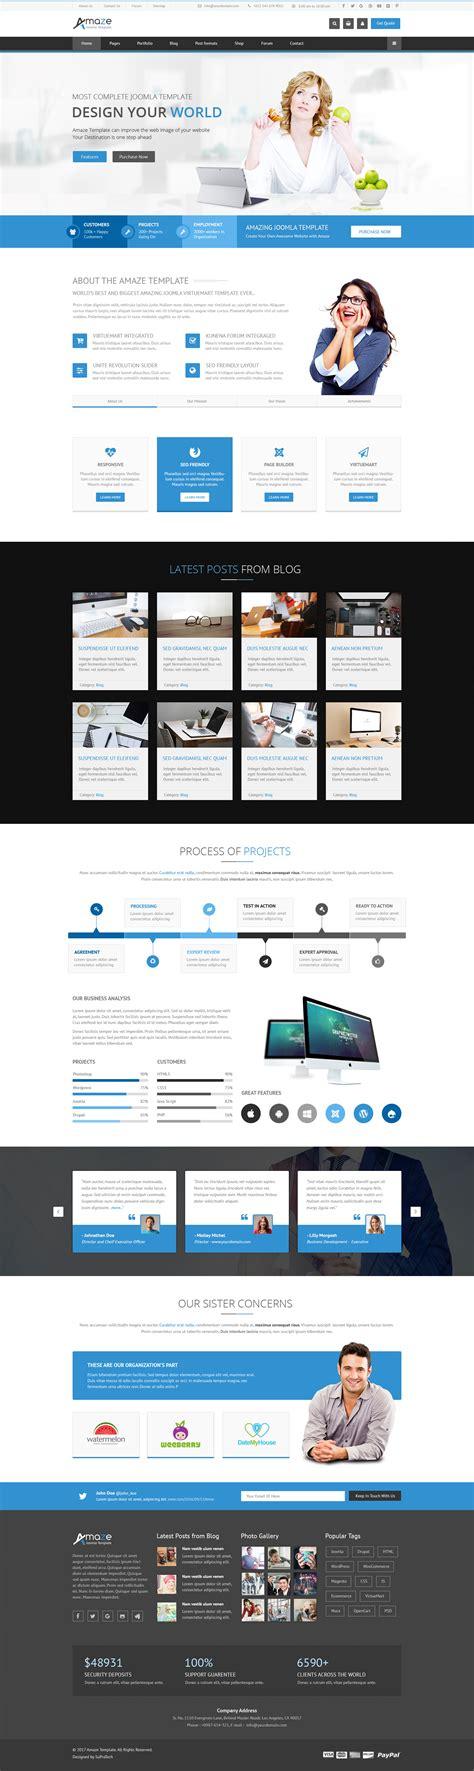 amaze corporate responsive multipurpose joomla template torrent amaze corporate responsive multi purpose joomla template